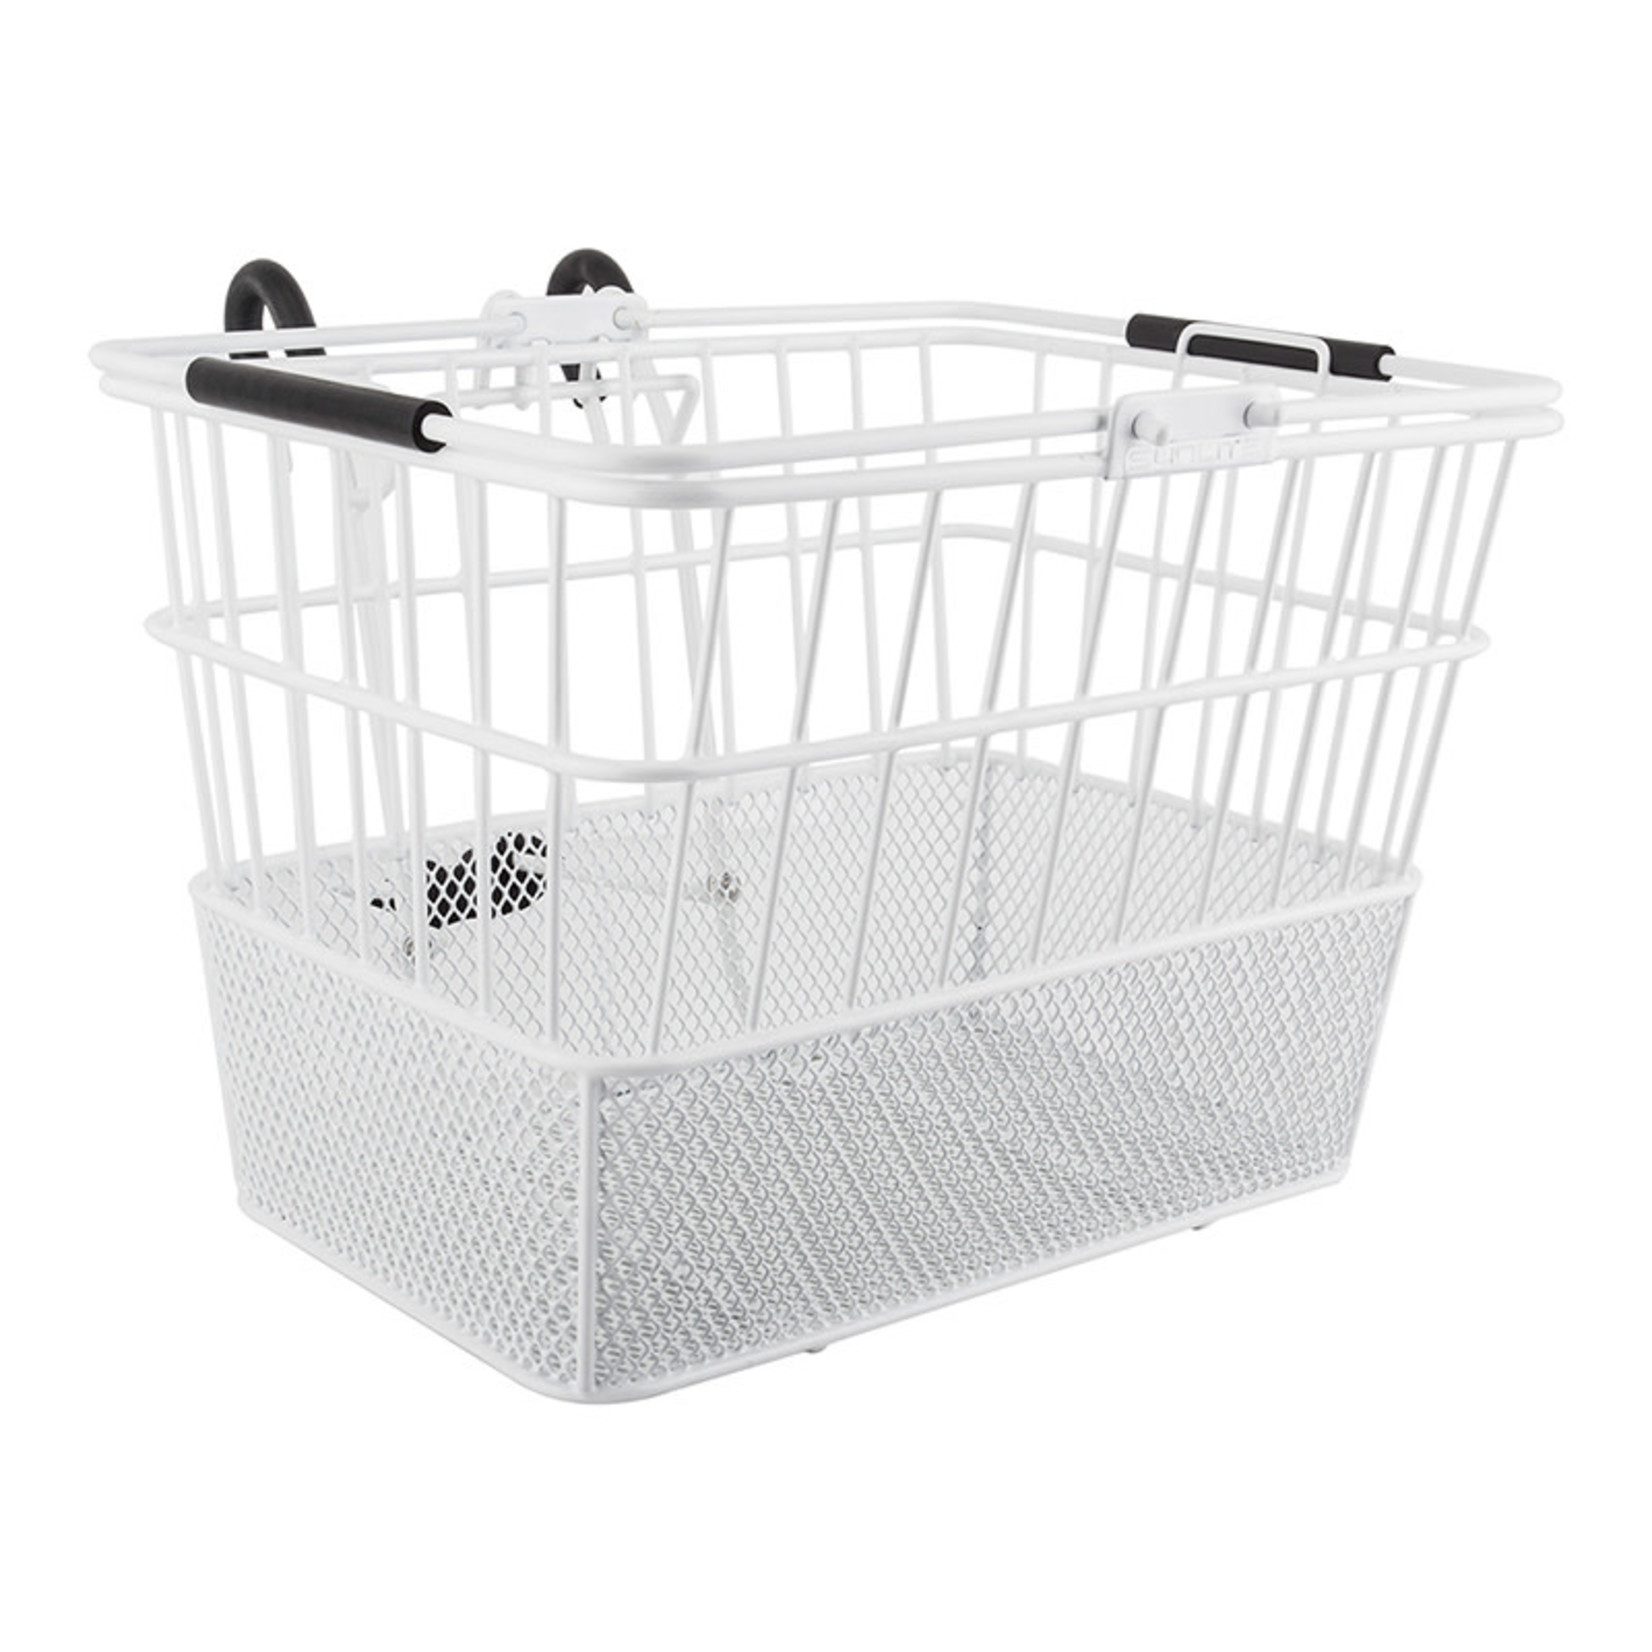 Standard Mesh Bottom Lift-Off White